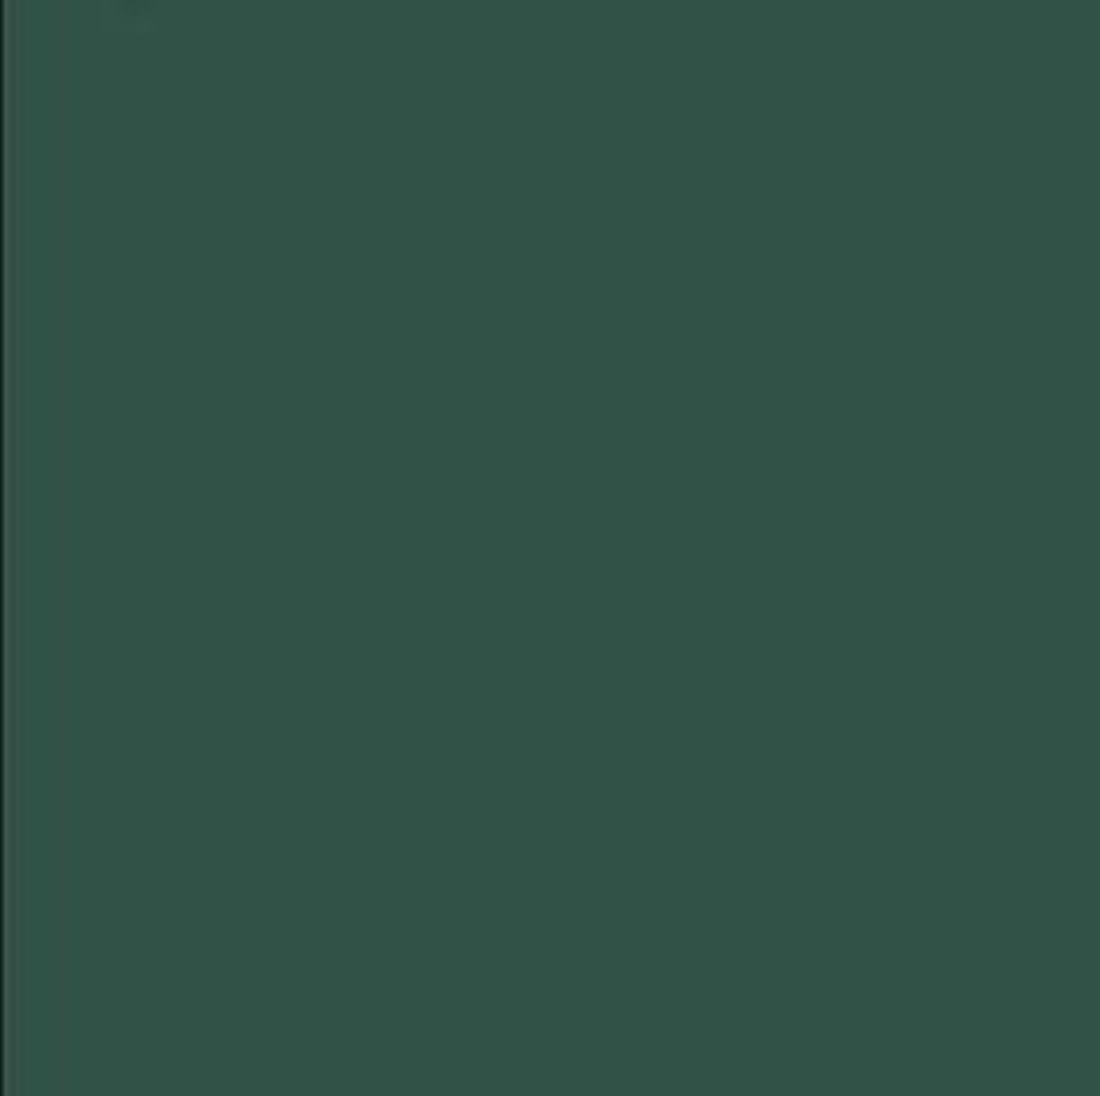 Farbton der Mai-Tech Holzlasur: Moosgrün